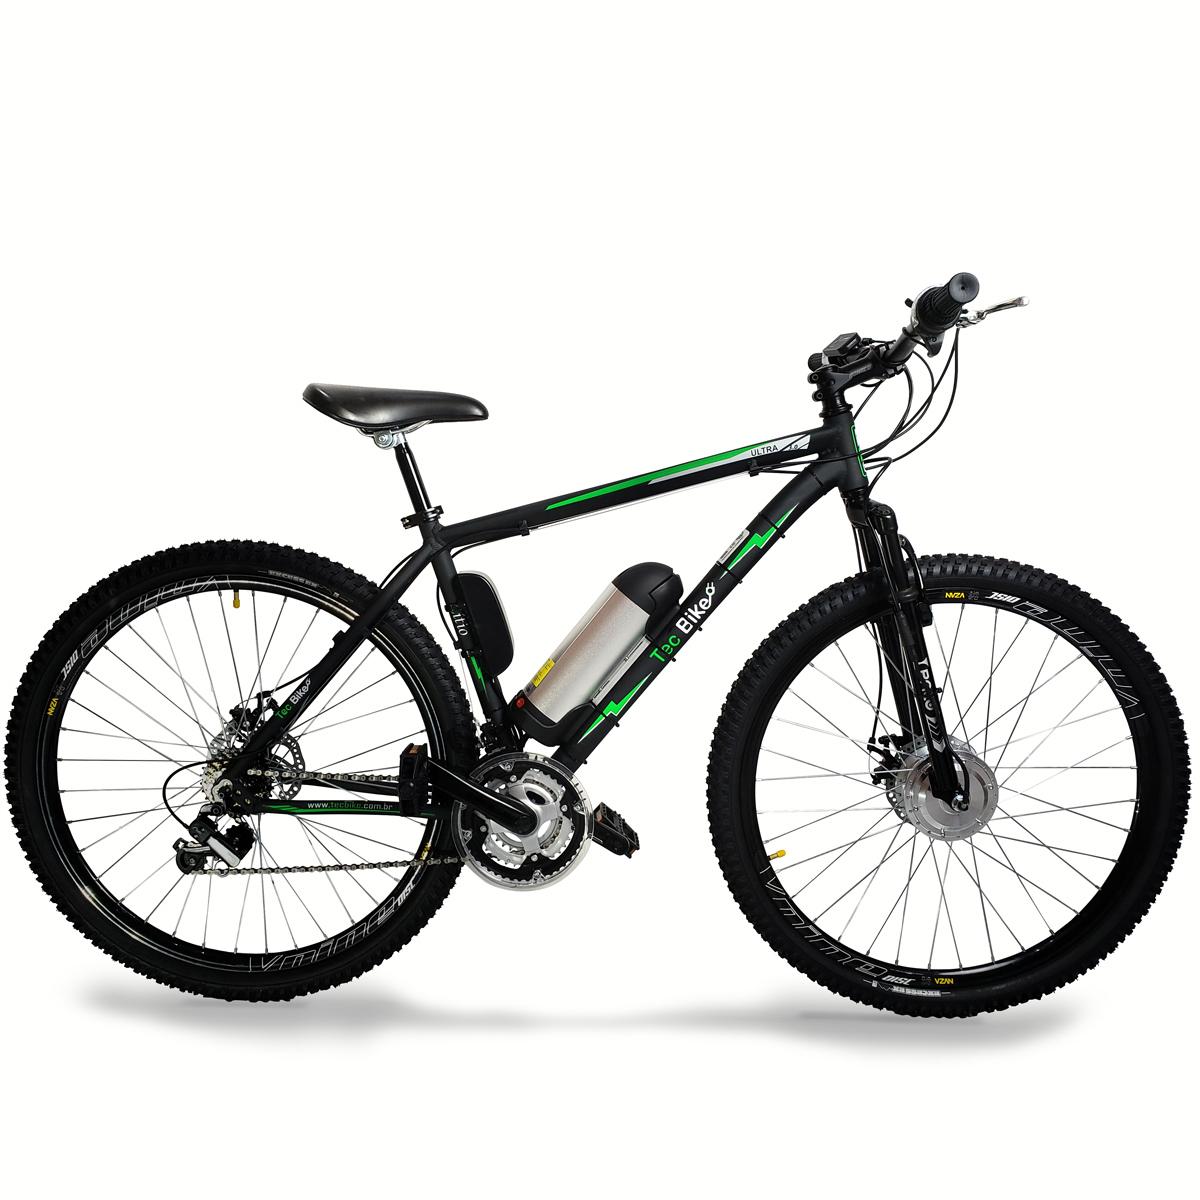 Bicicleta Elétrica Aro29 Bateria de LÍTIO TecUltra3.0 Freio Hidráulico- 500W